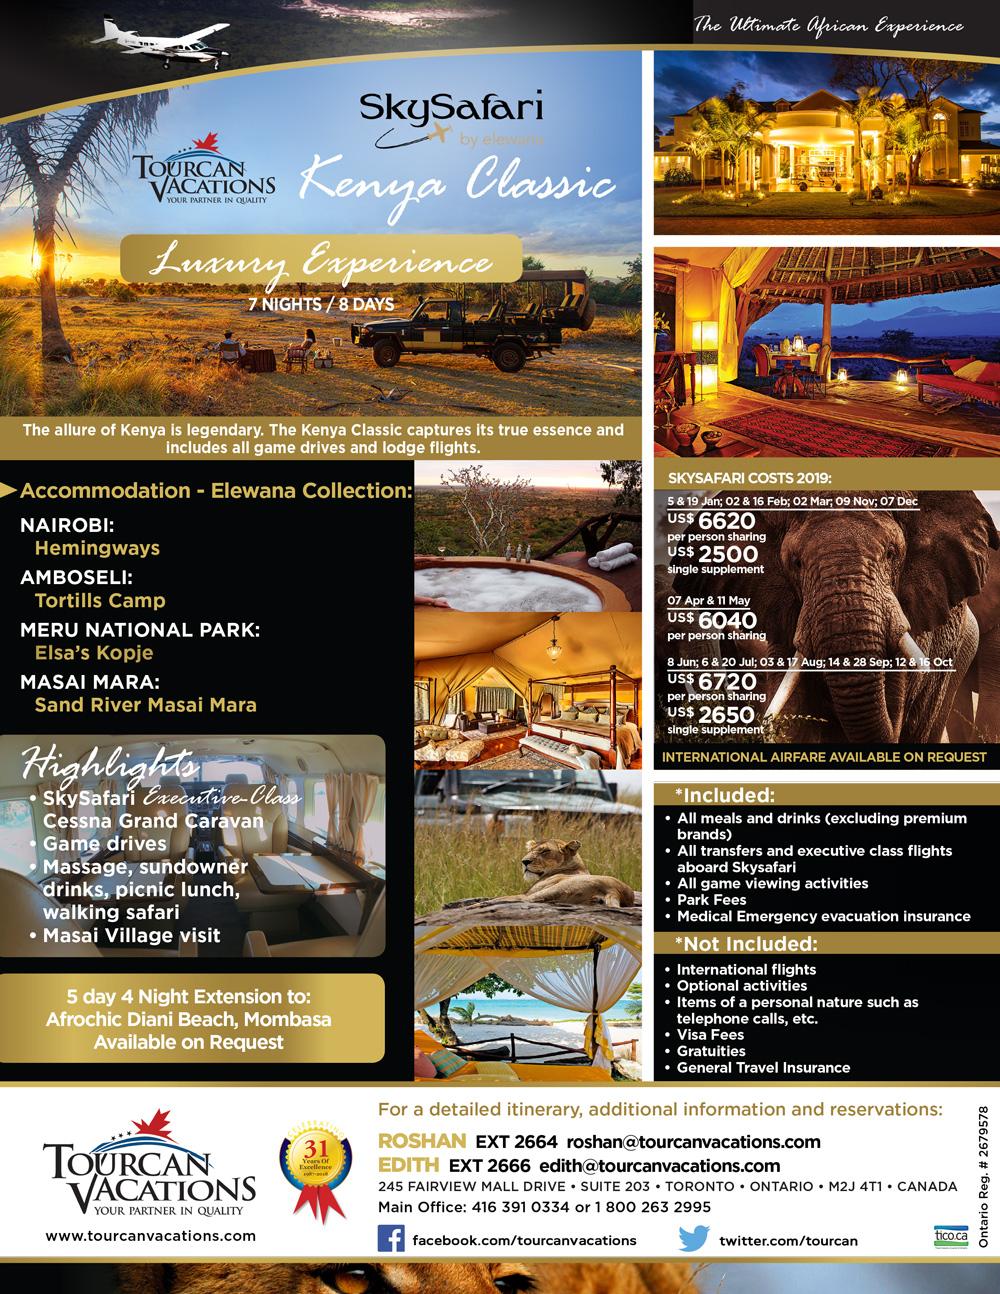 tourcan-2019-promo-africa-kenya-skysafari-luxury-WEB